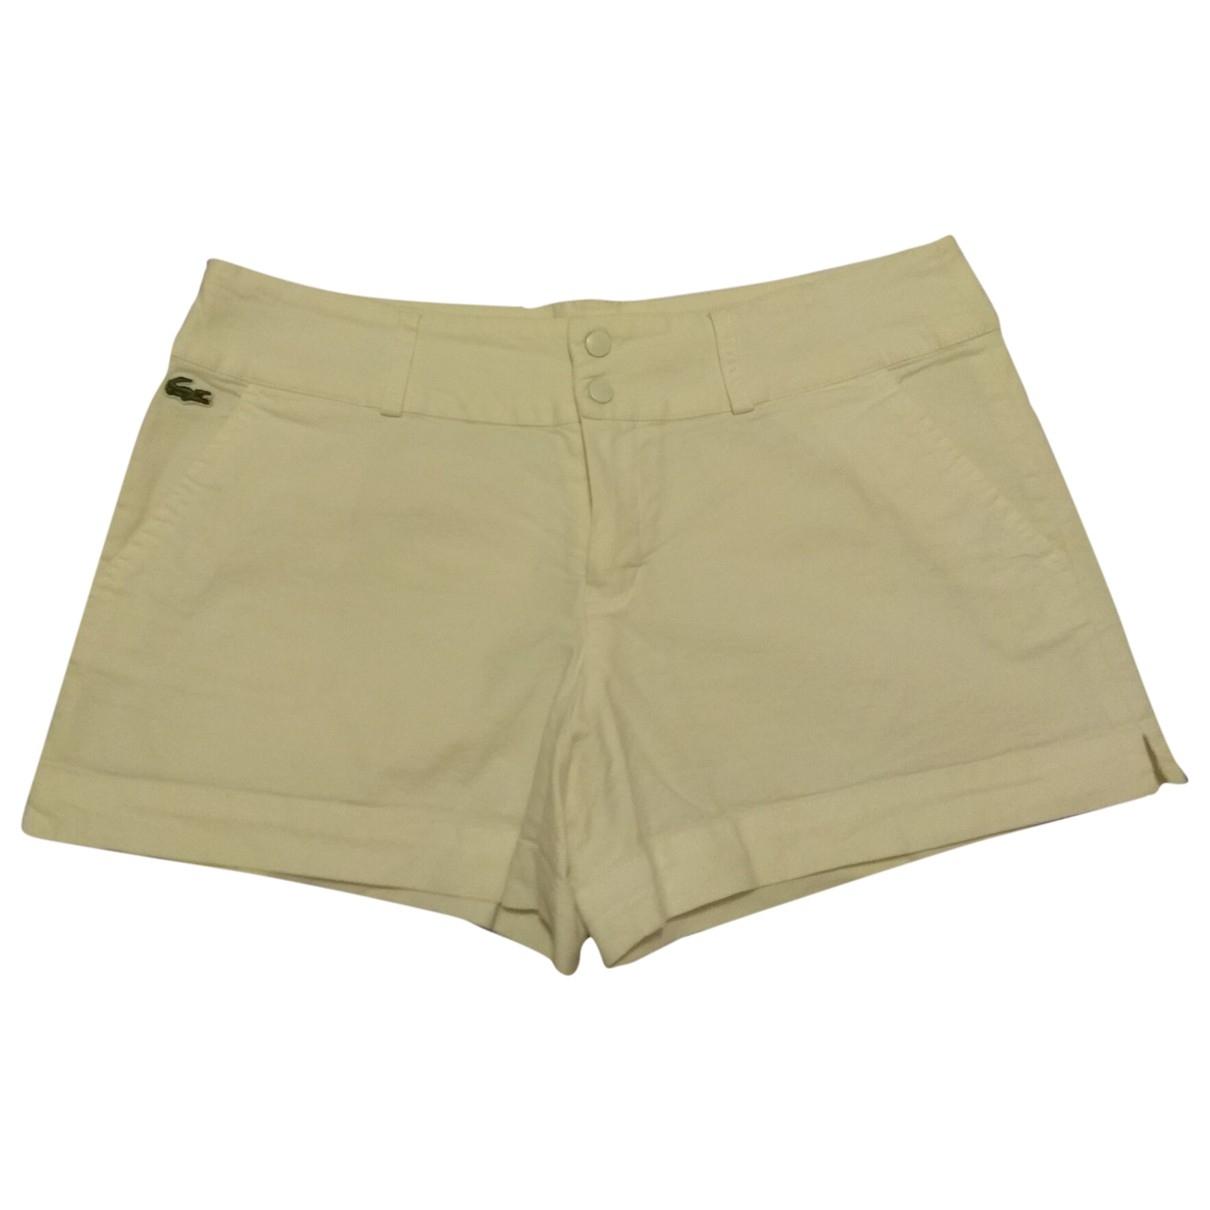 Lacoste \N Shorts in  Weiss Baumwolle - Elasthan